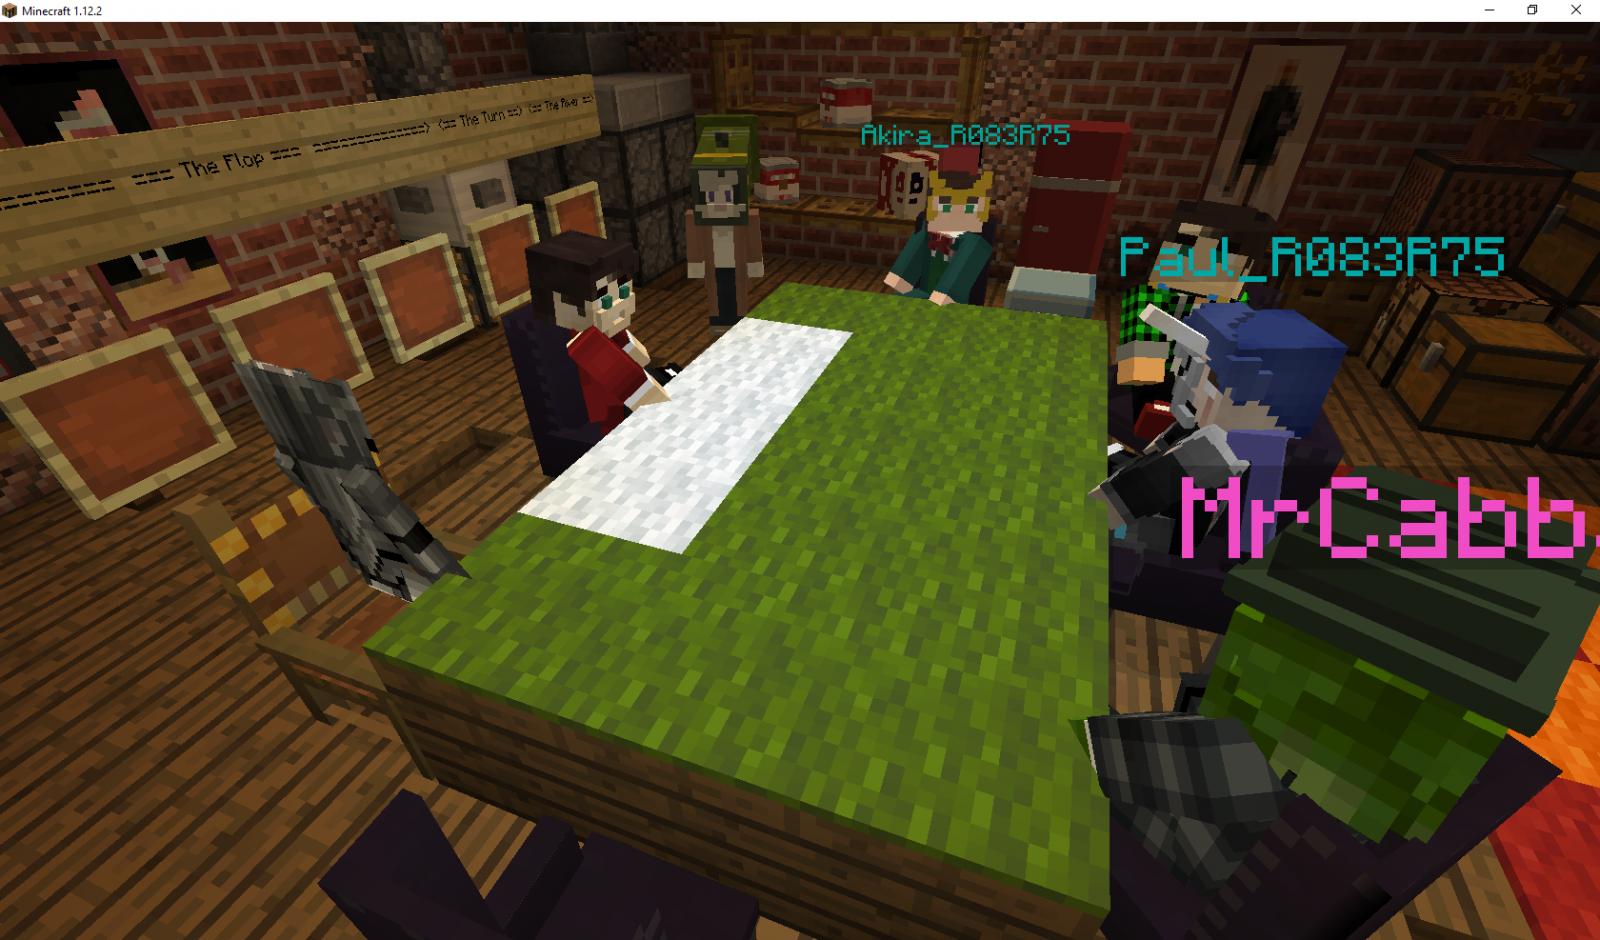 Minecraft 1.12.2 18_07_2021 22_06_39.png